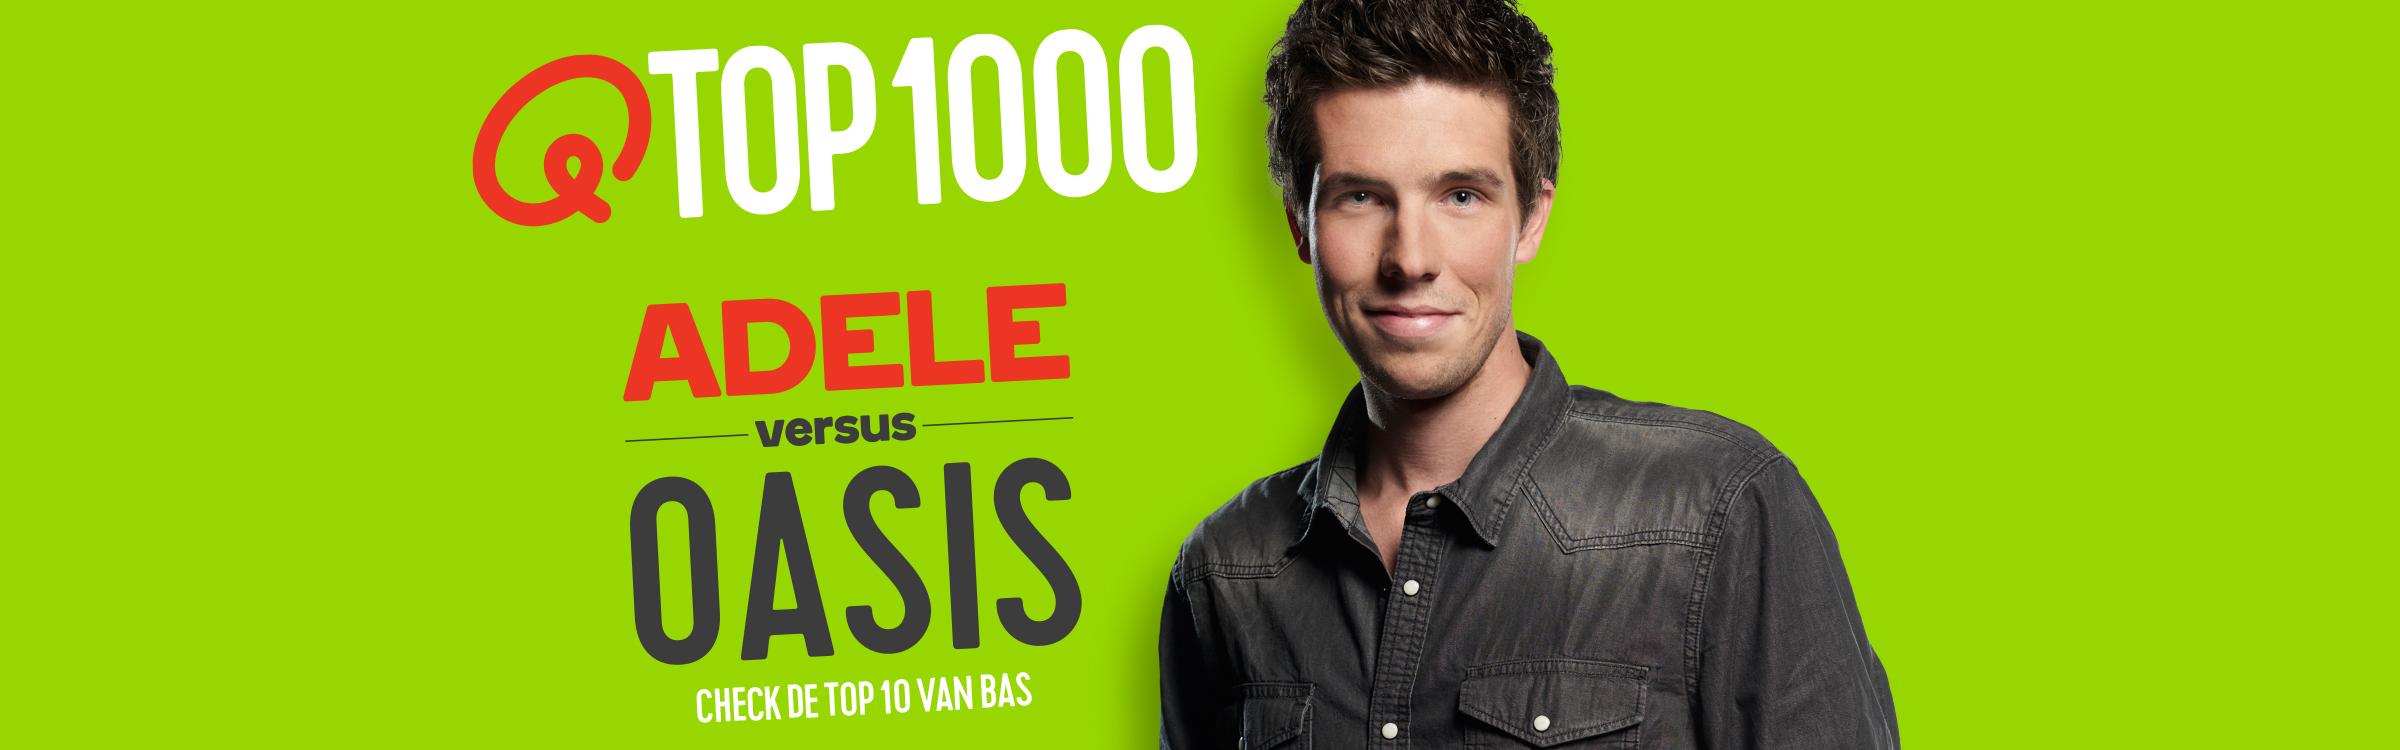 Qmusic actionheader top1000 djs bas